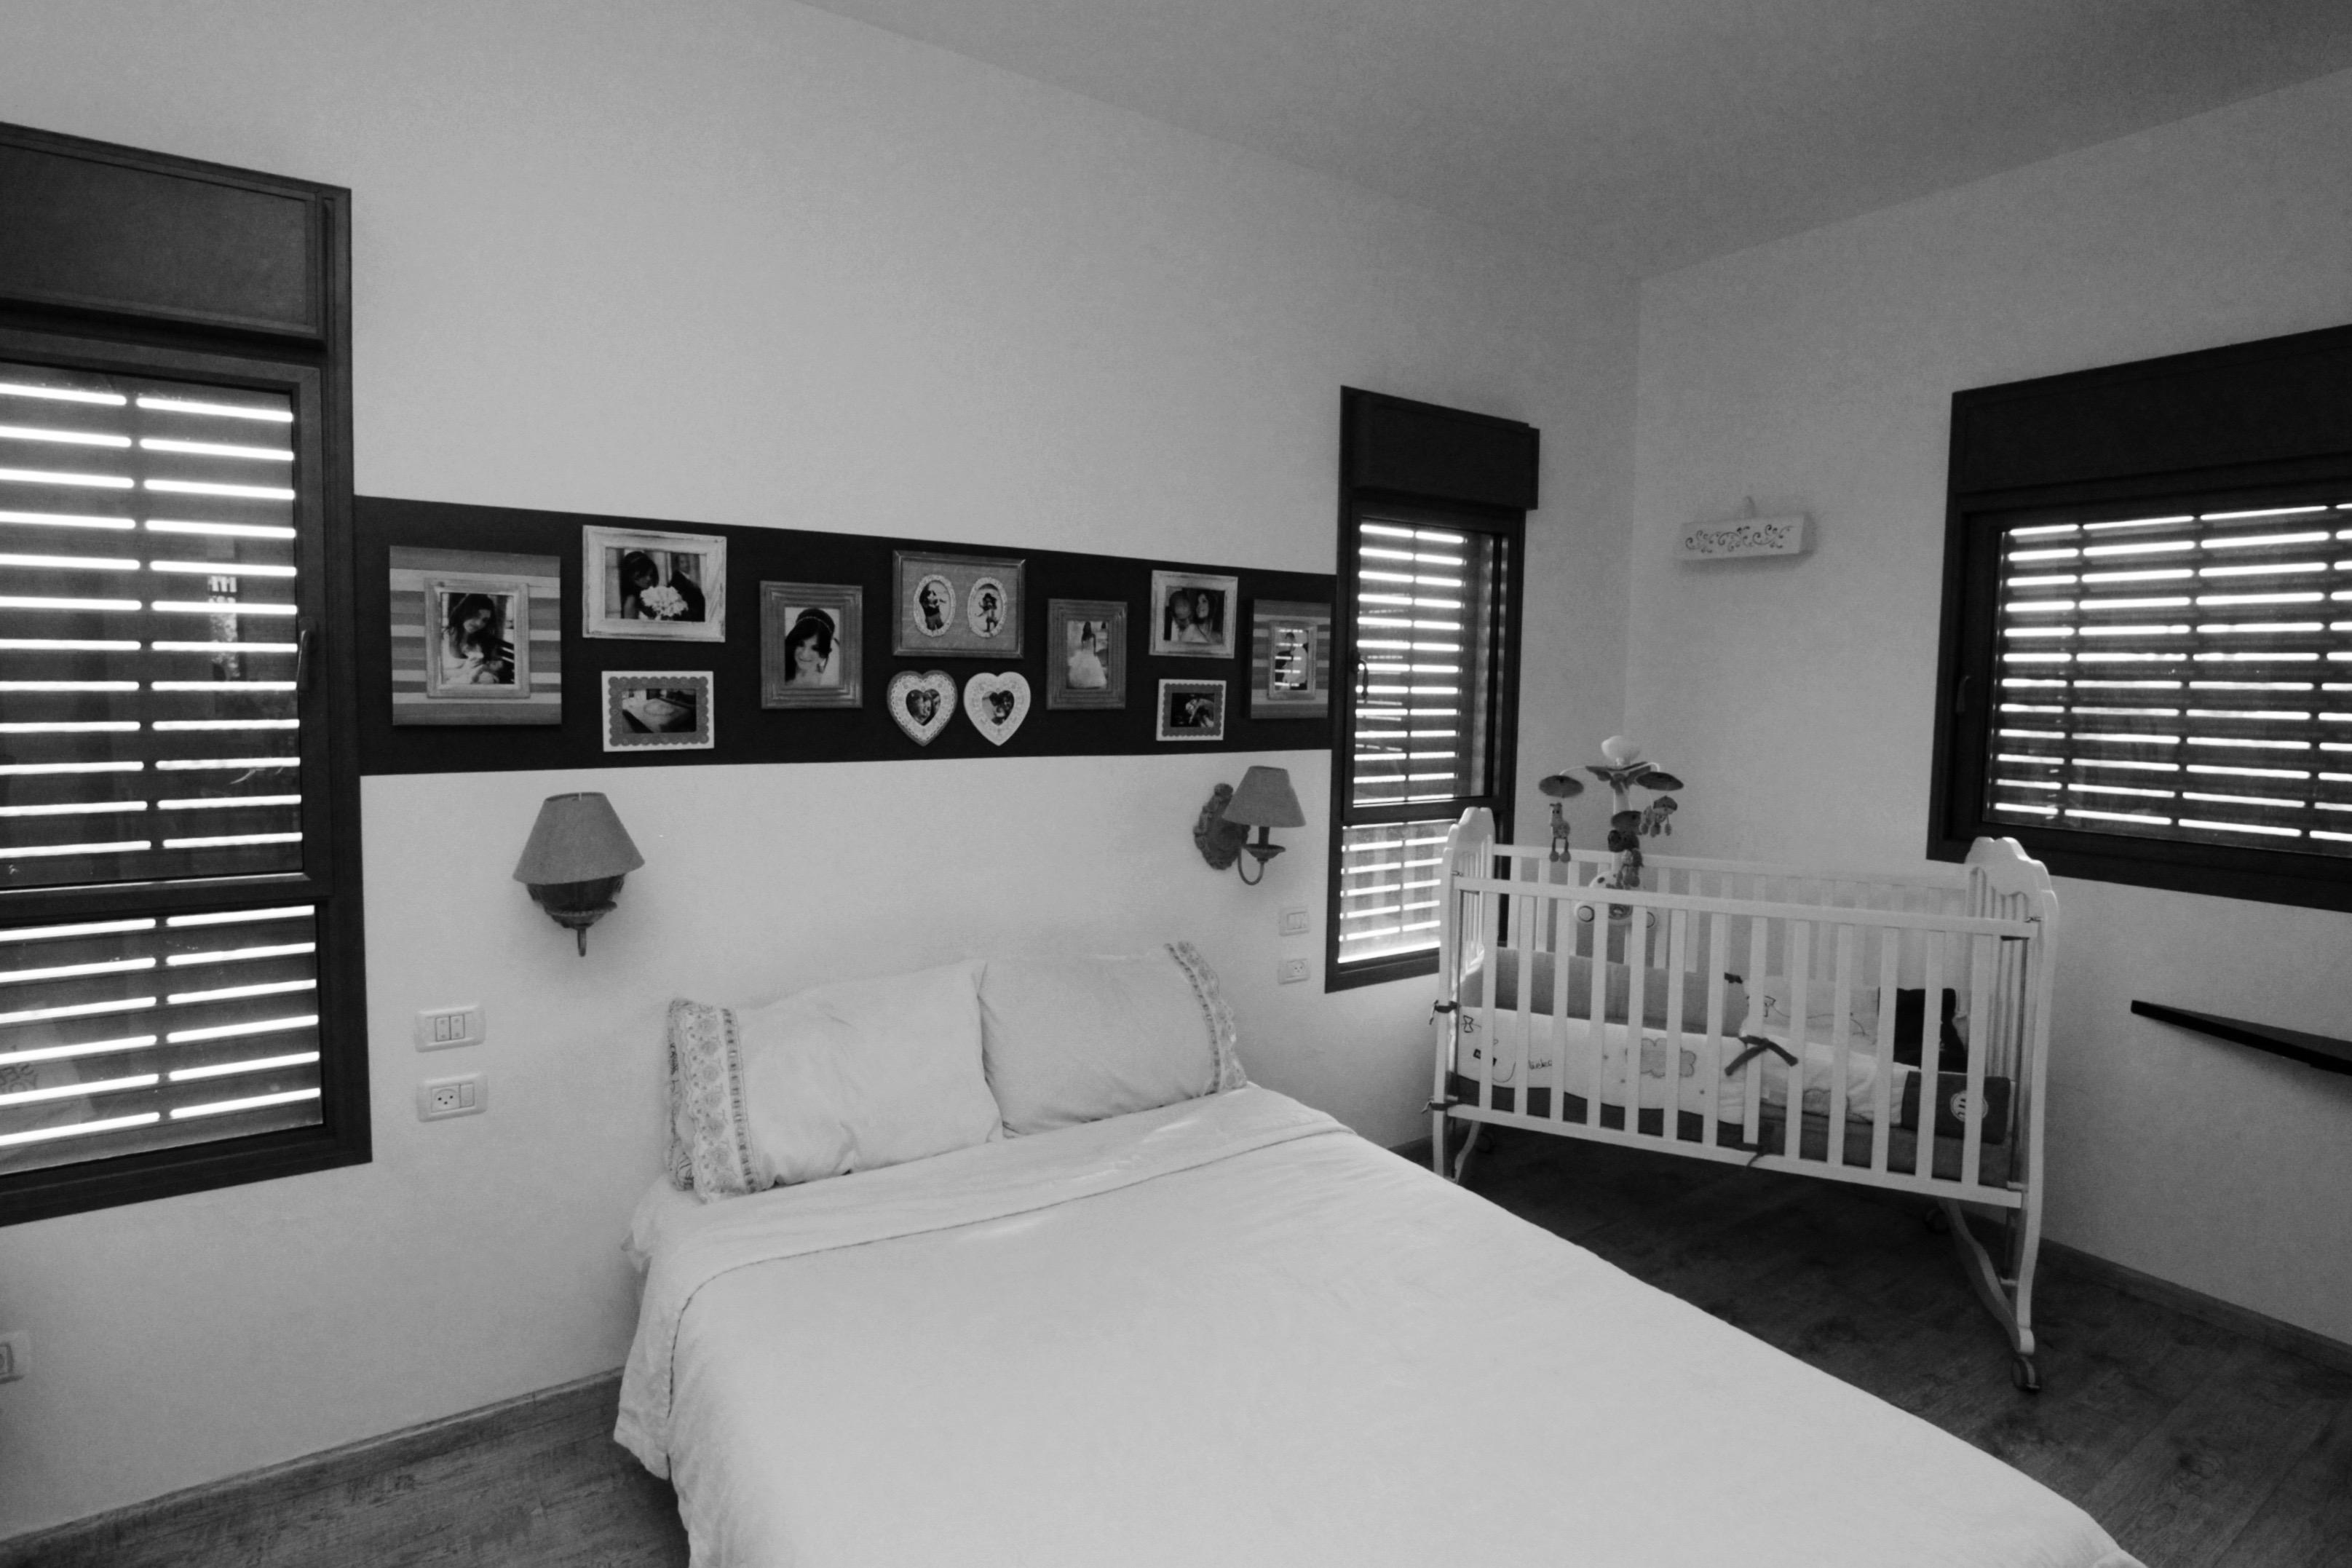 (צילום: Black & White) (צילום: Black & White)